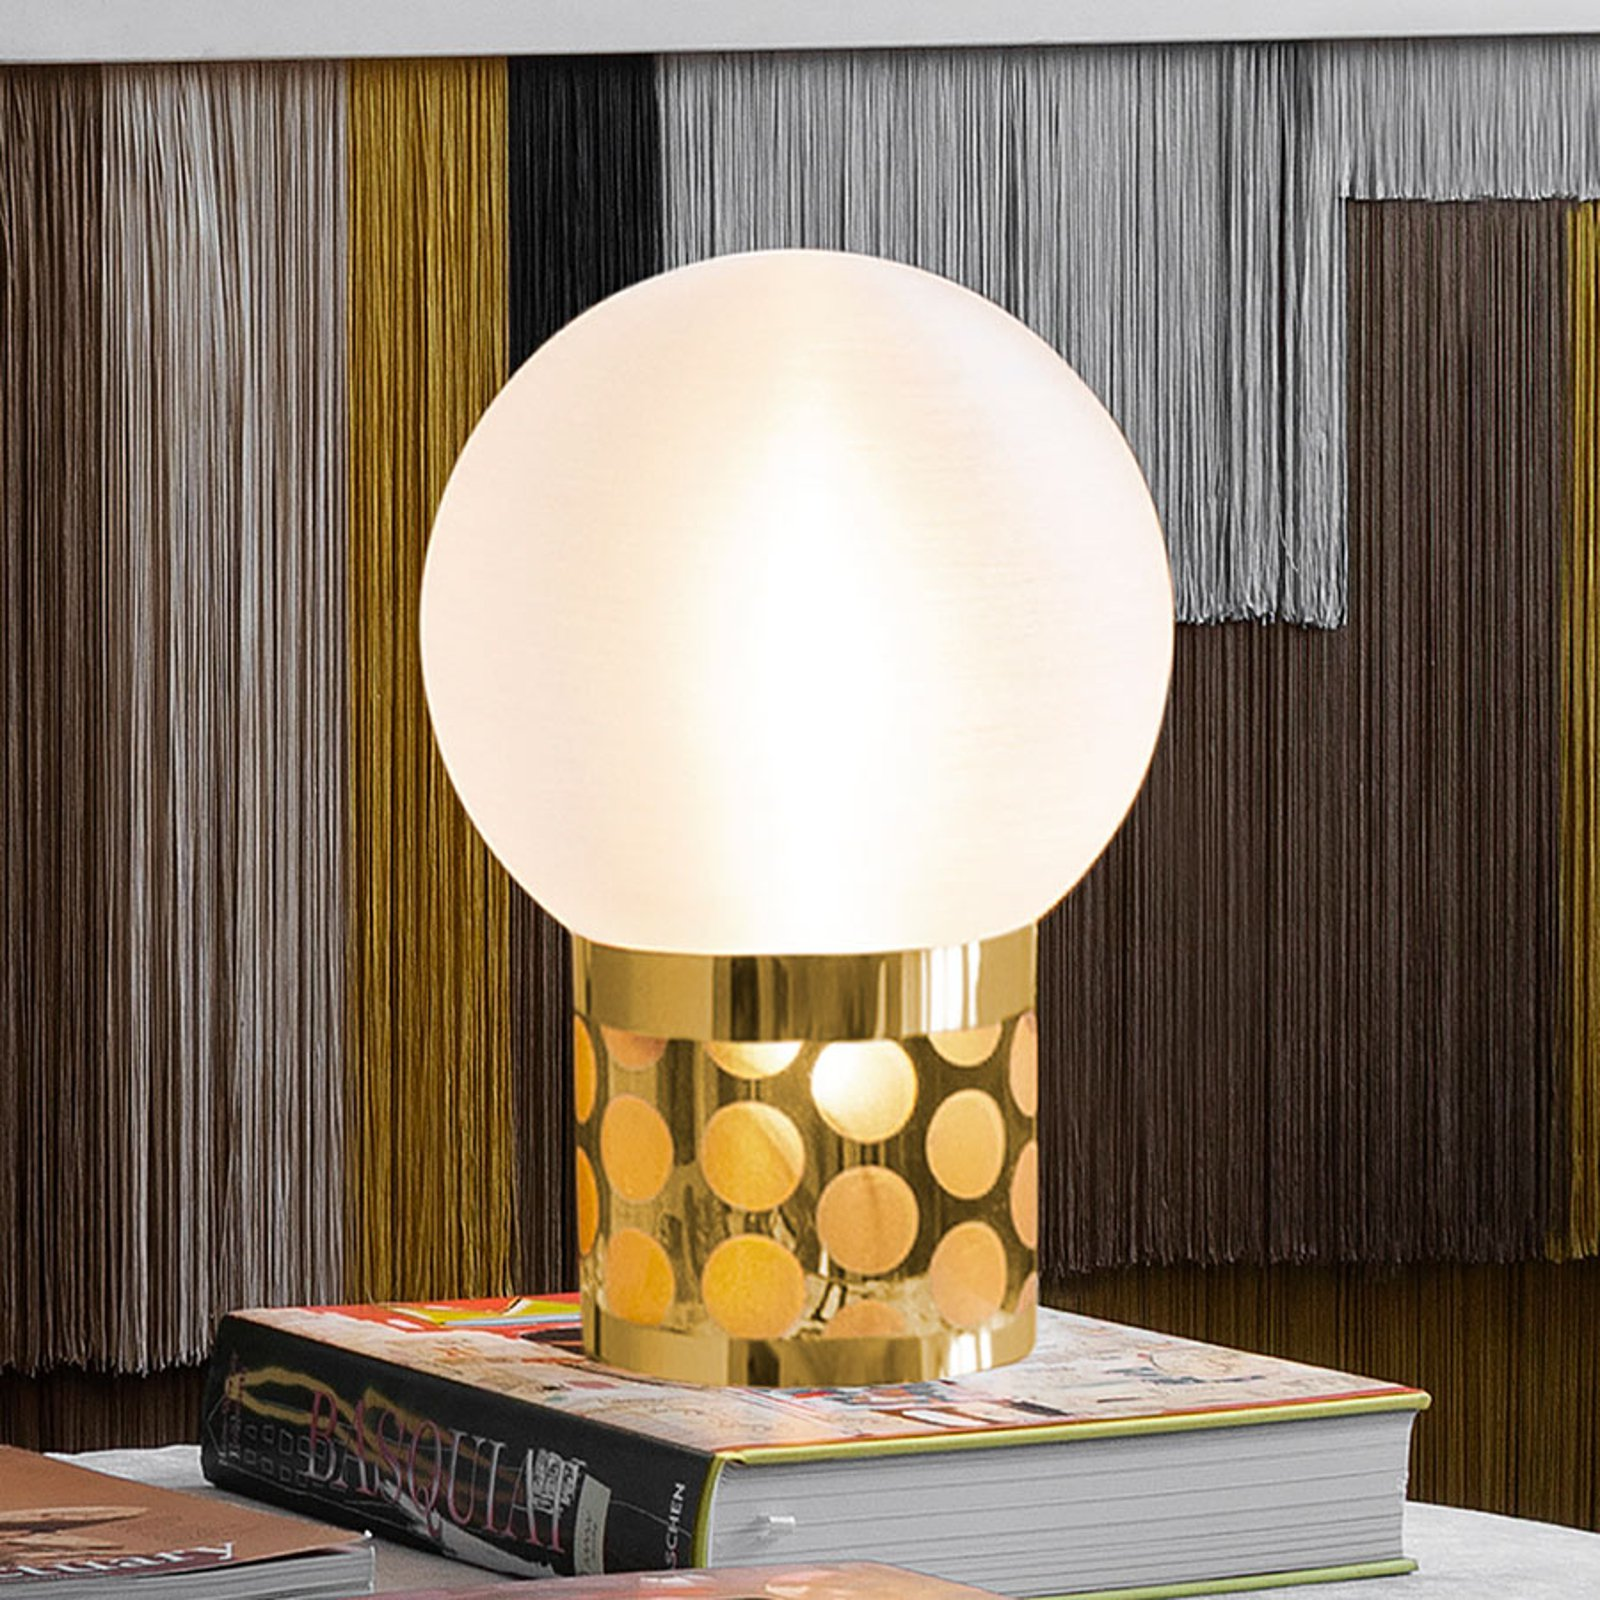 Slamp Atmosfera bordlampe, Ø 20 cm, gull